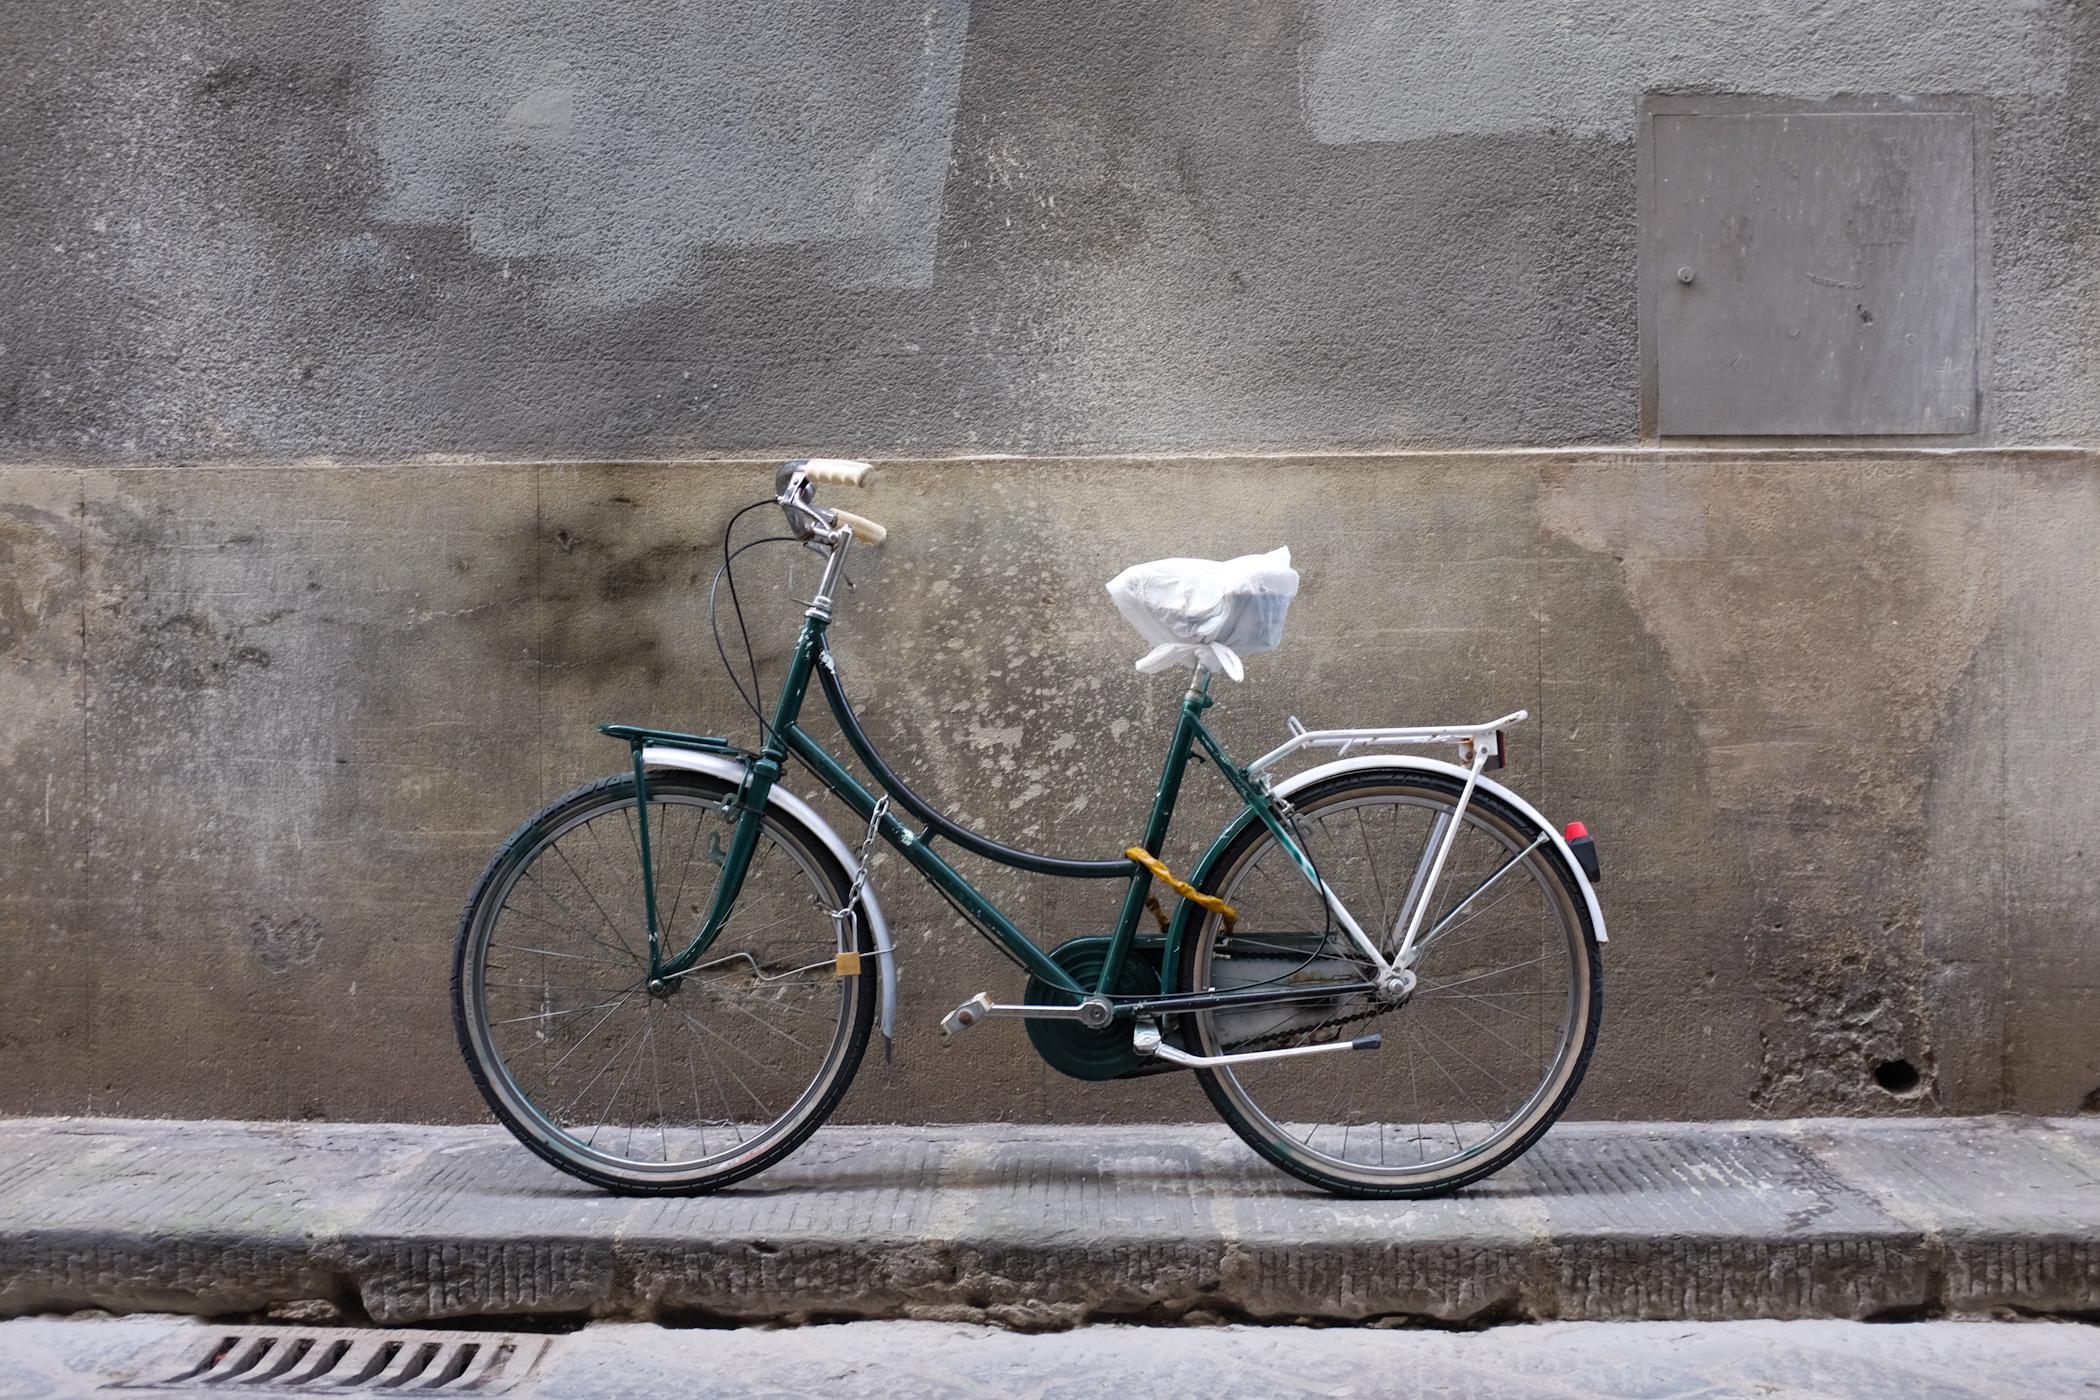 bicicletti di firenze portfolio-2.jpg